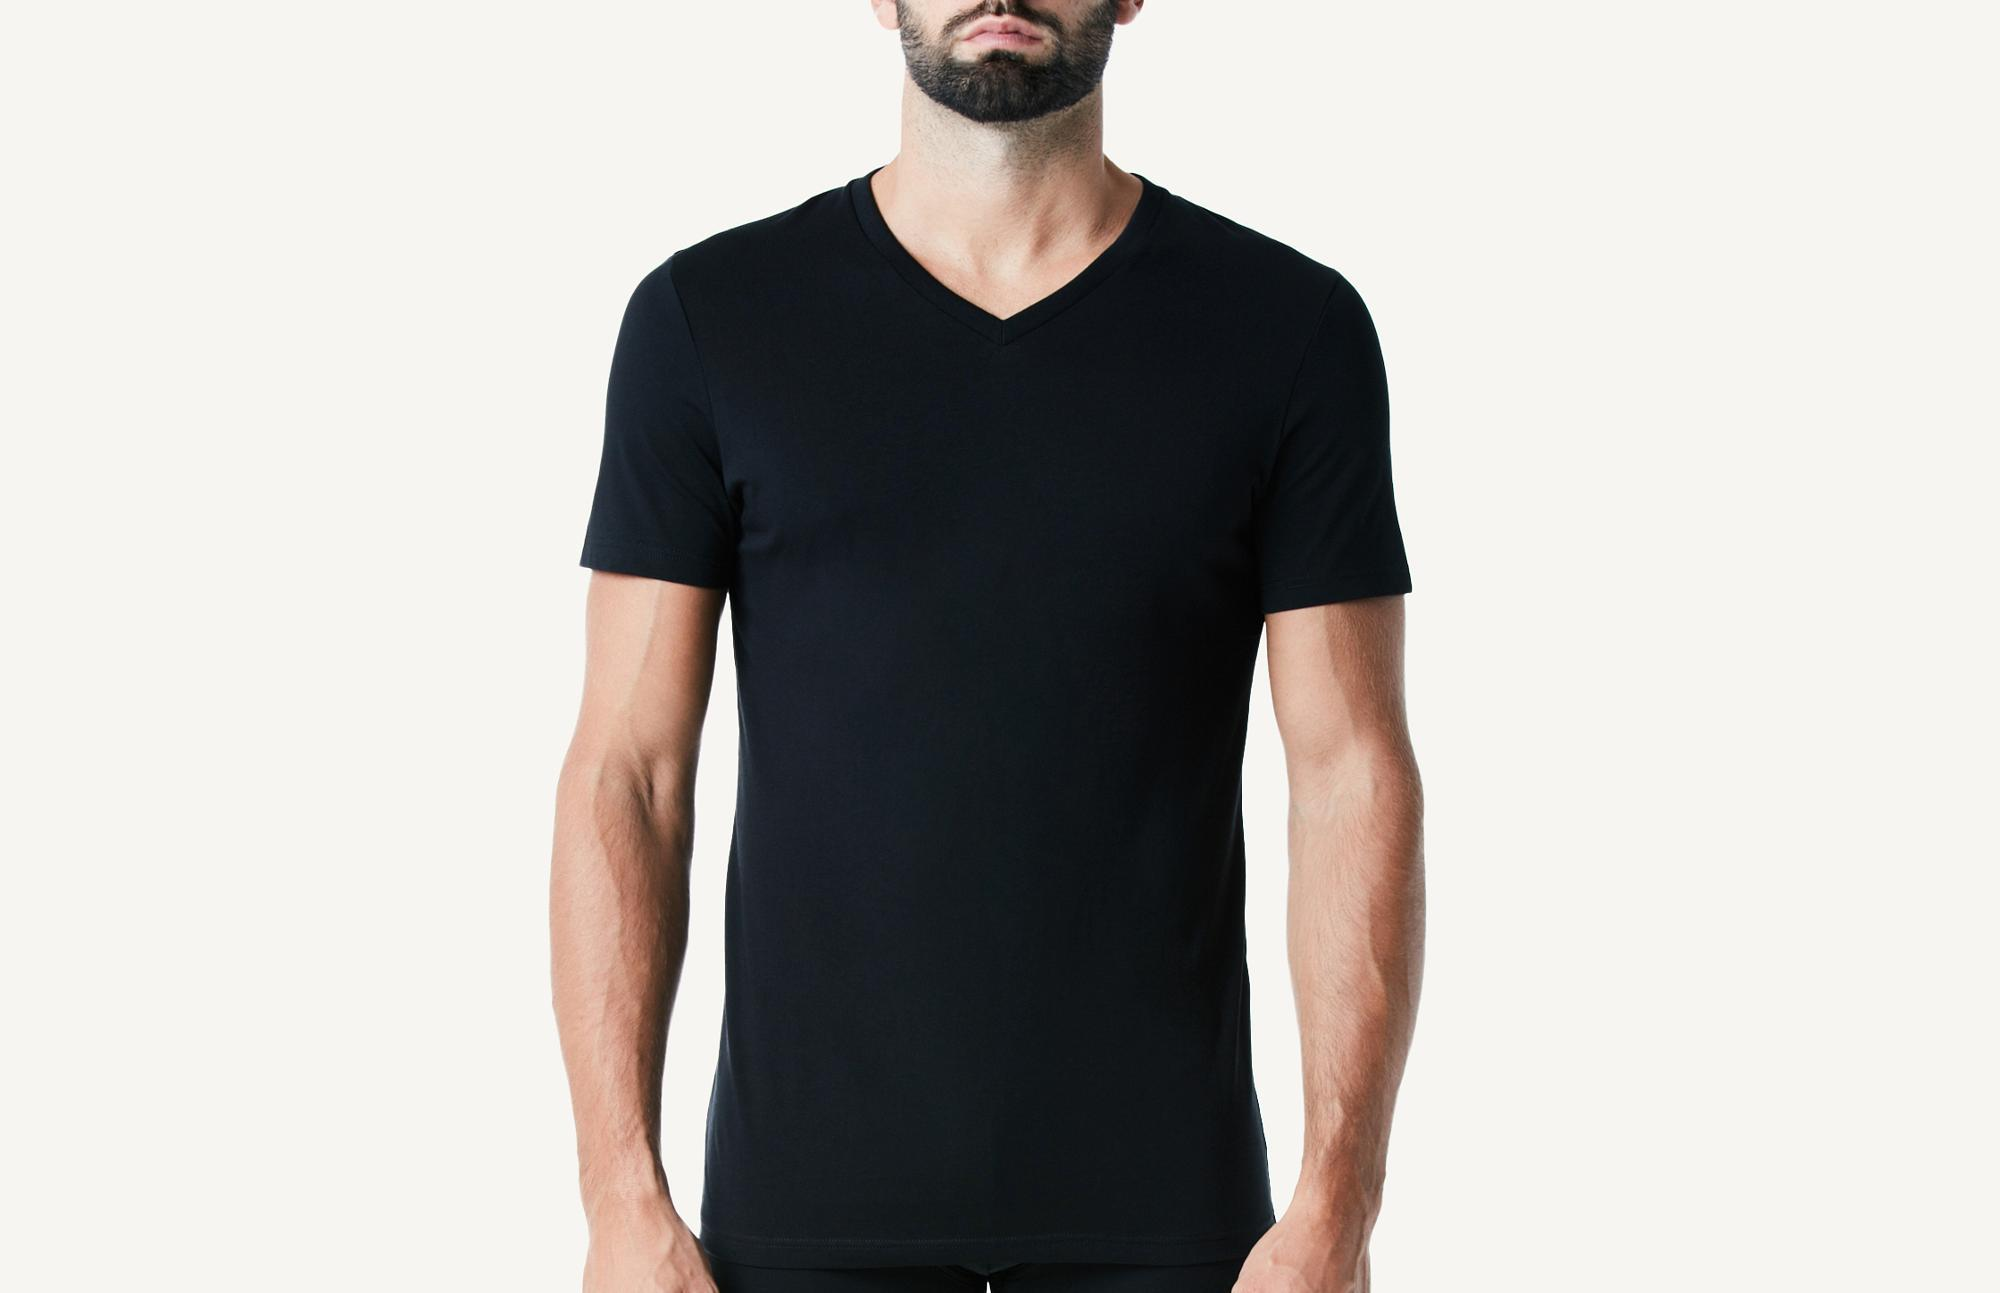 Intimissimi Mens Short Sleeve V-Neck T Shirt in Supima Cotton